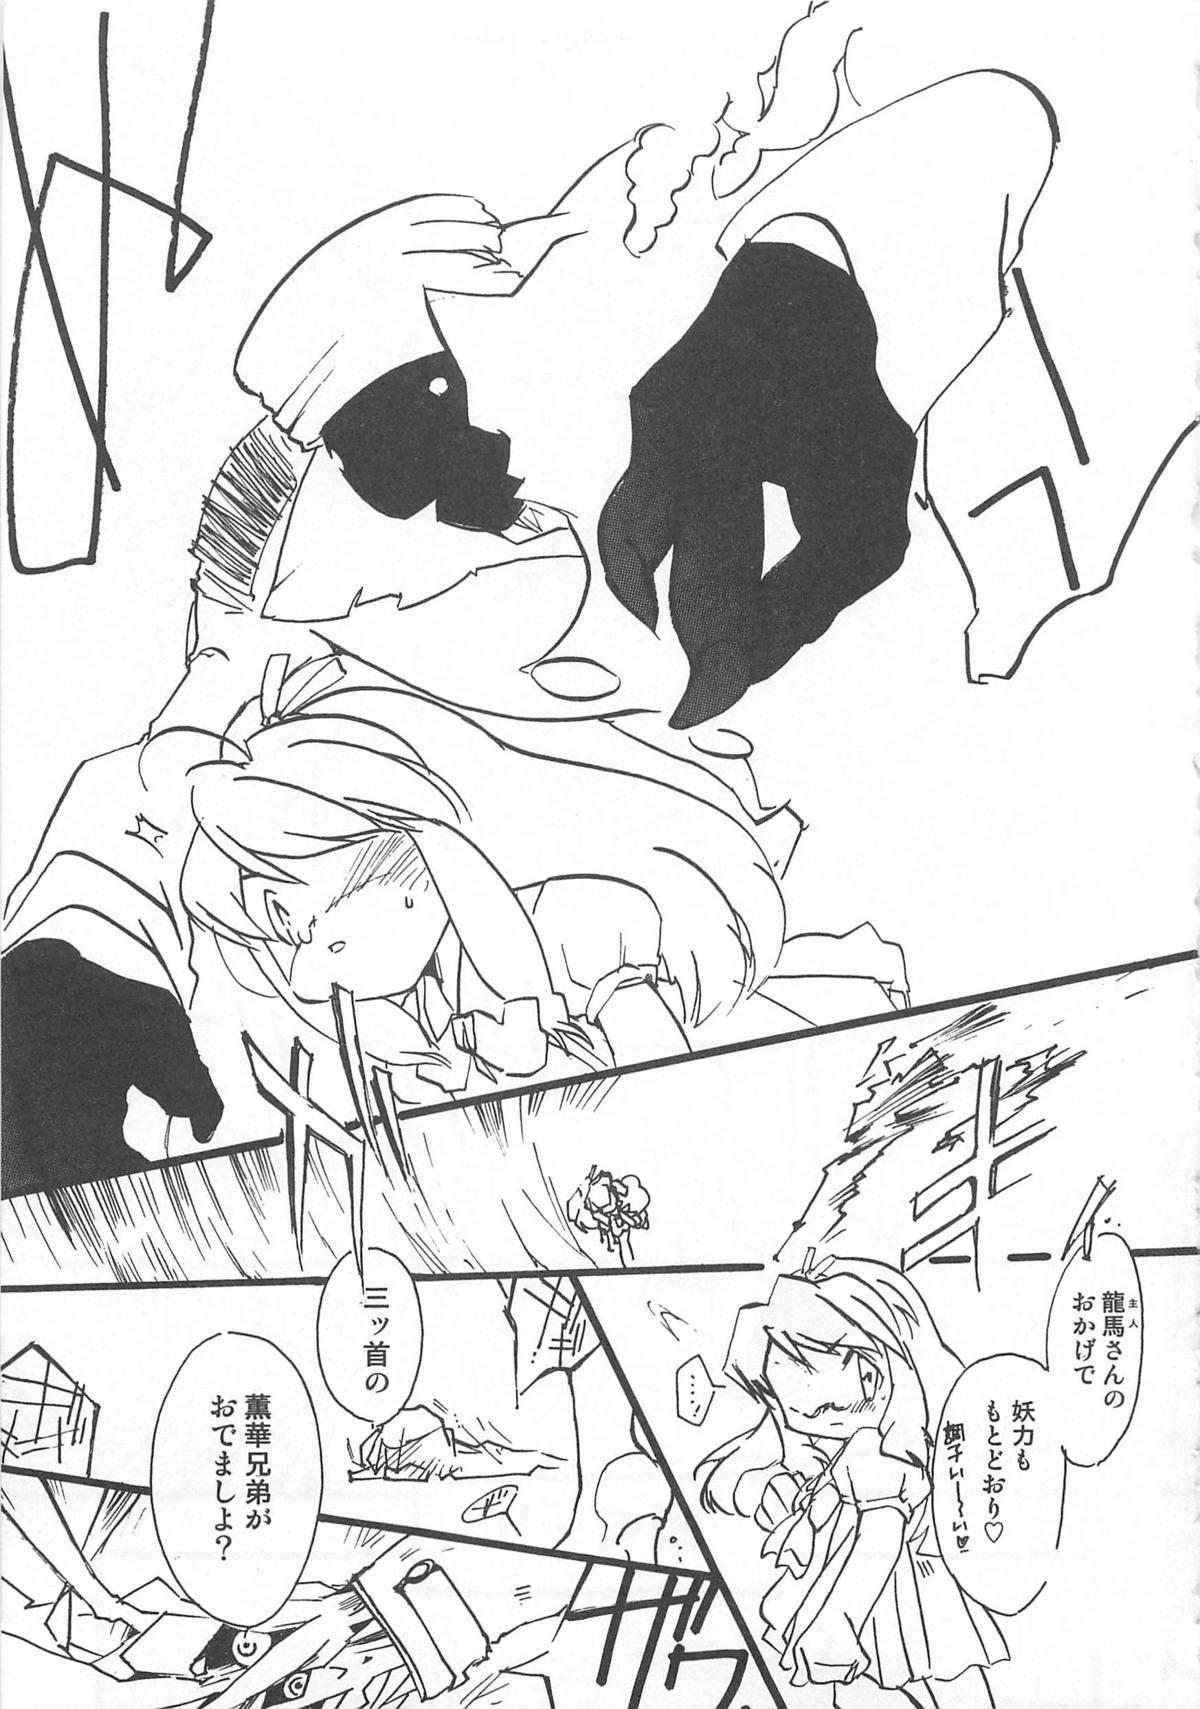 Otokonoko HEAVEN Vol. 02 Dokidoki Chikan Taiken 19